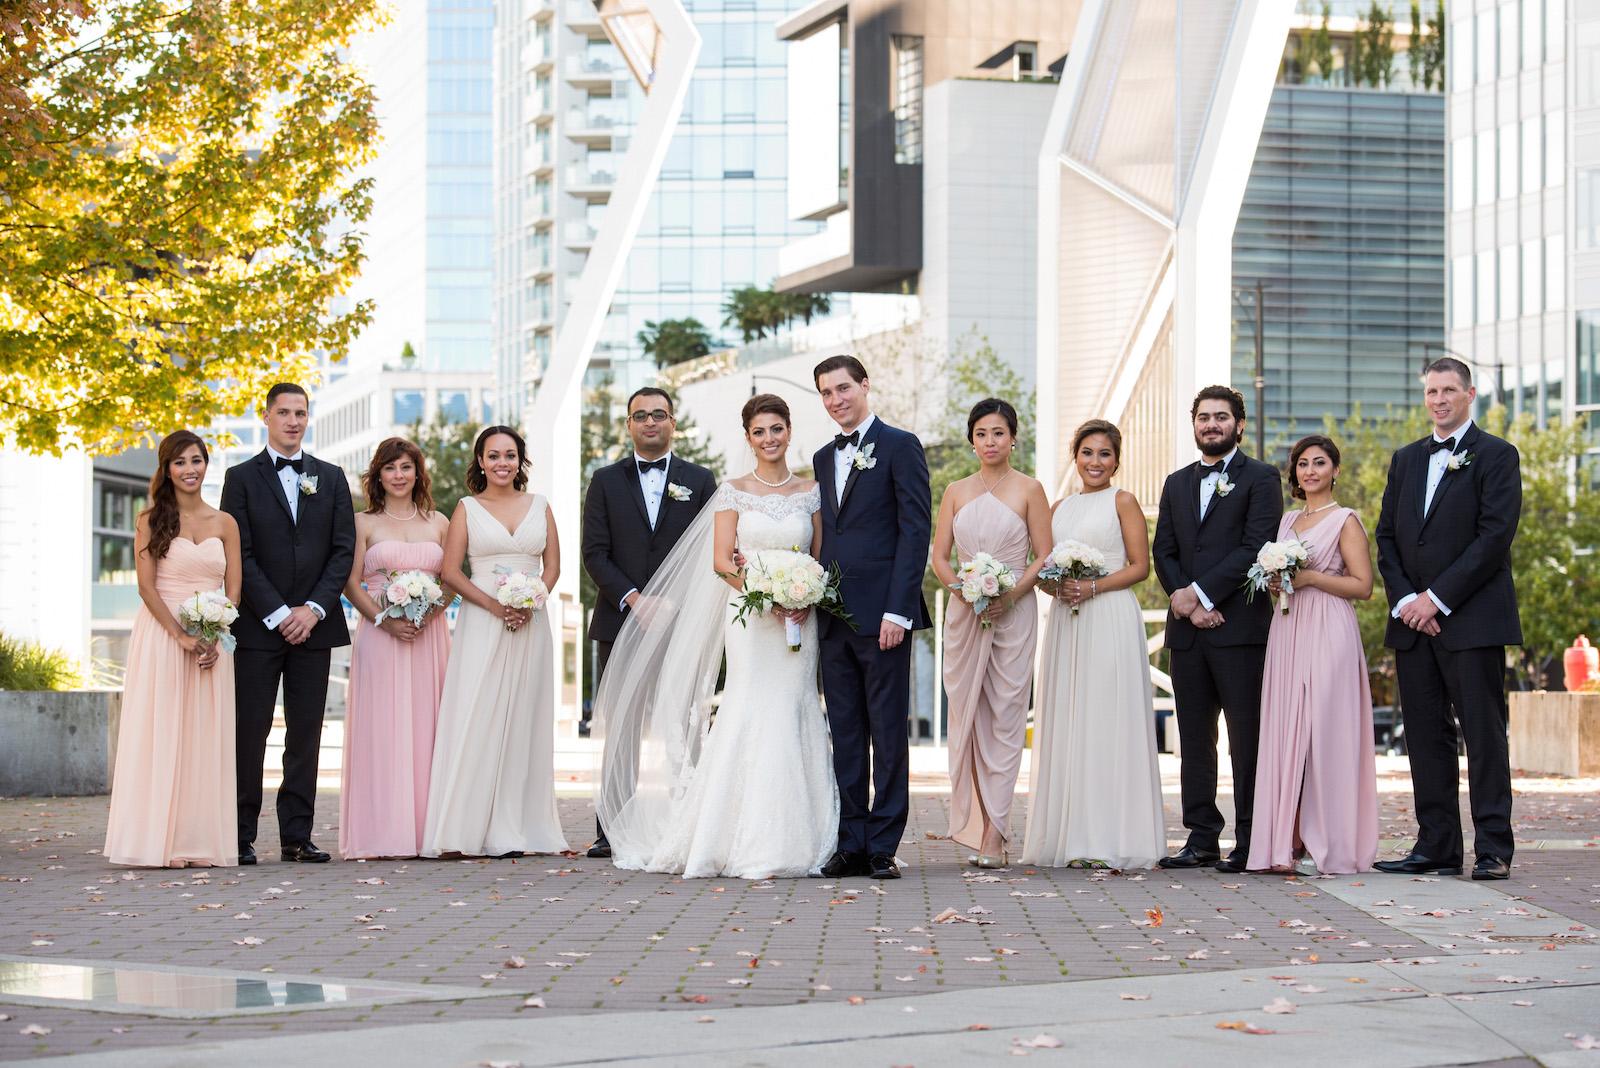 victoria-wedding-photographers-fairmont-pacific-rim-wedding-27.jpg